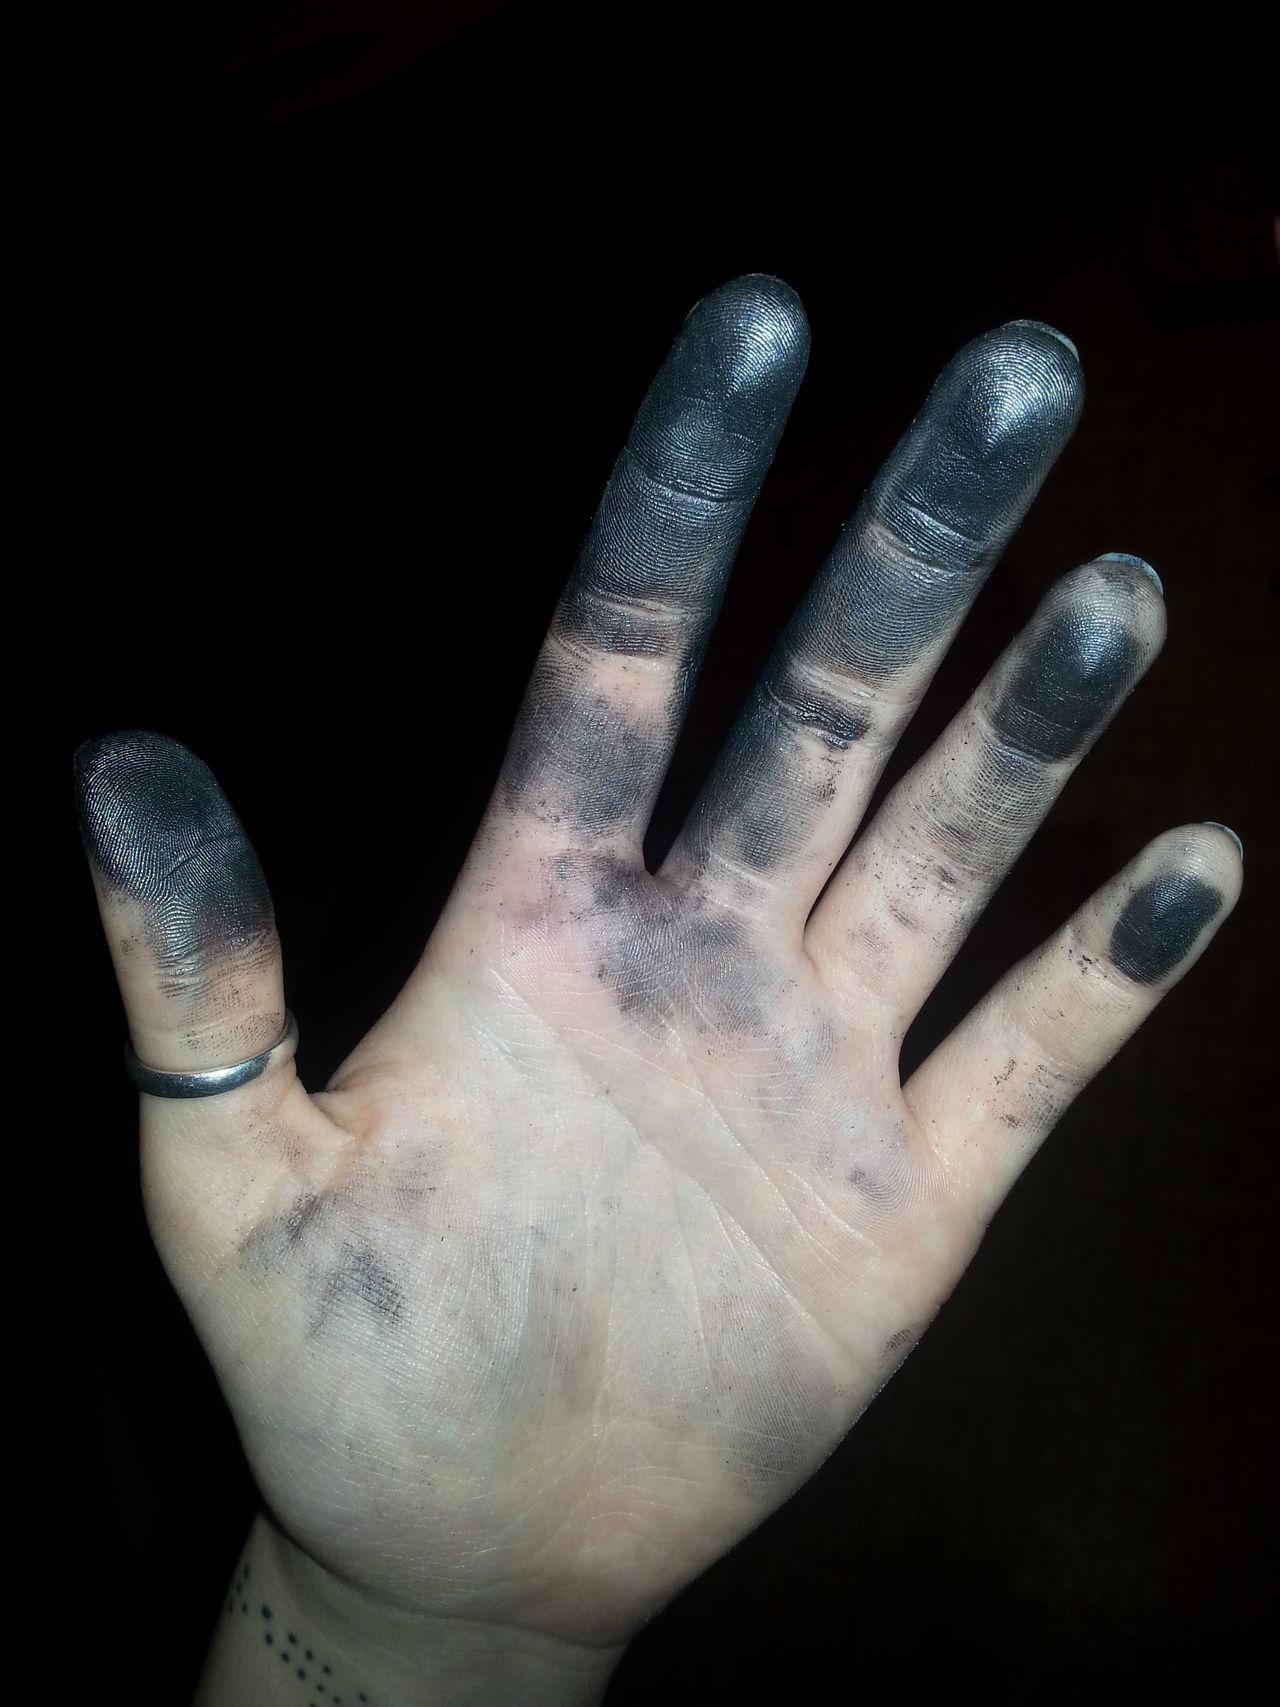 Art Black Background Close-up Crafts Glittering Graphite Human Body Part Human Finger Human Hand Studio Shot